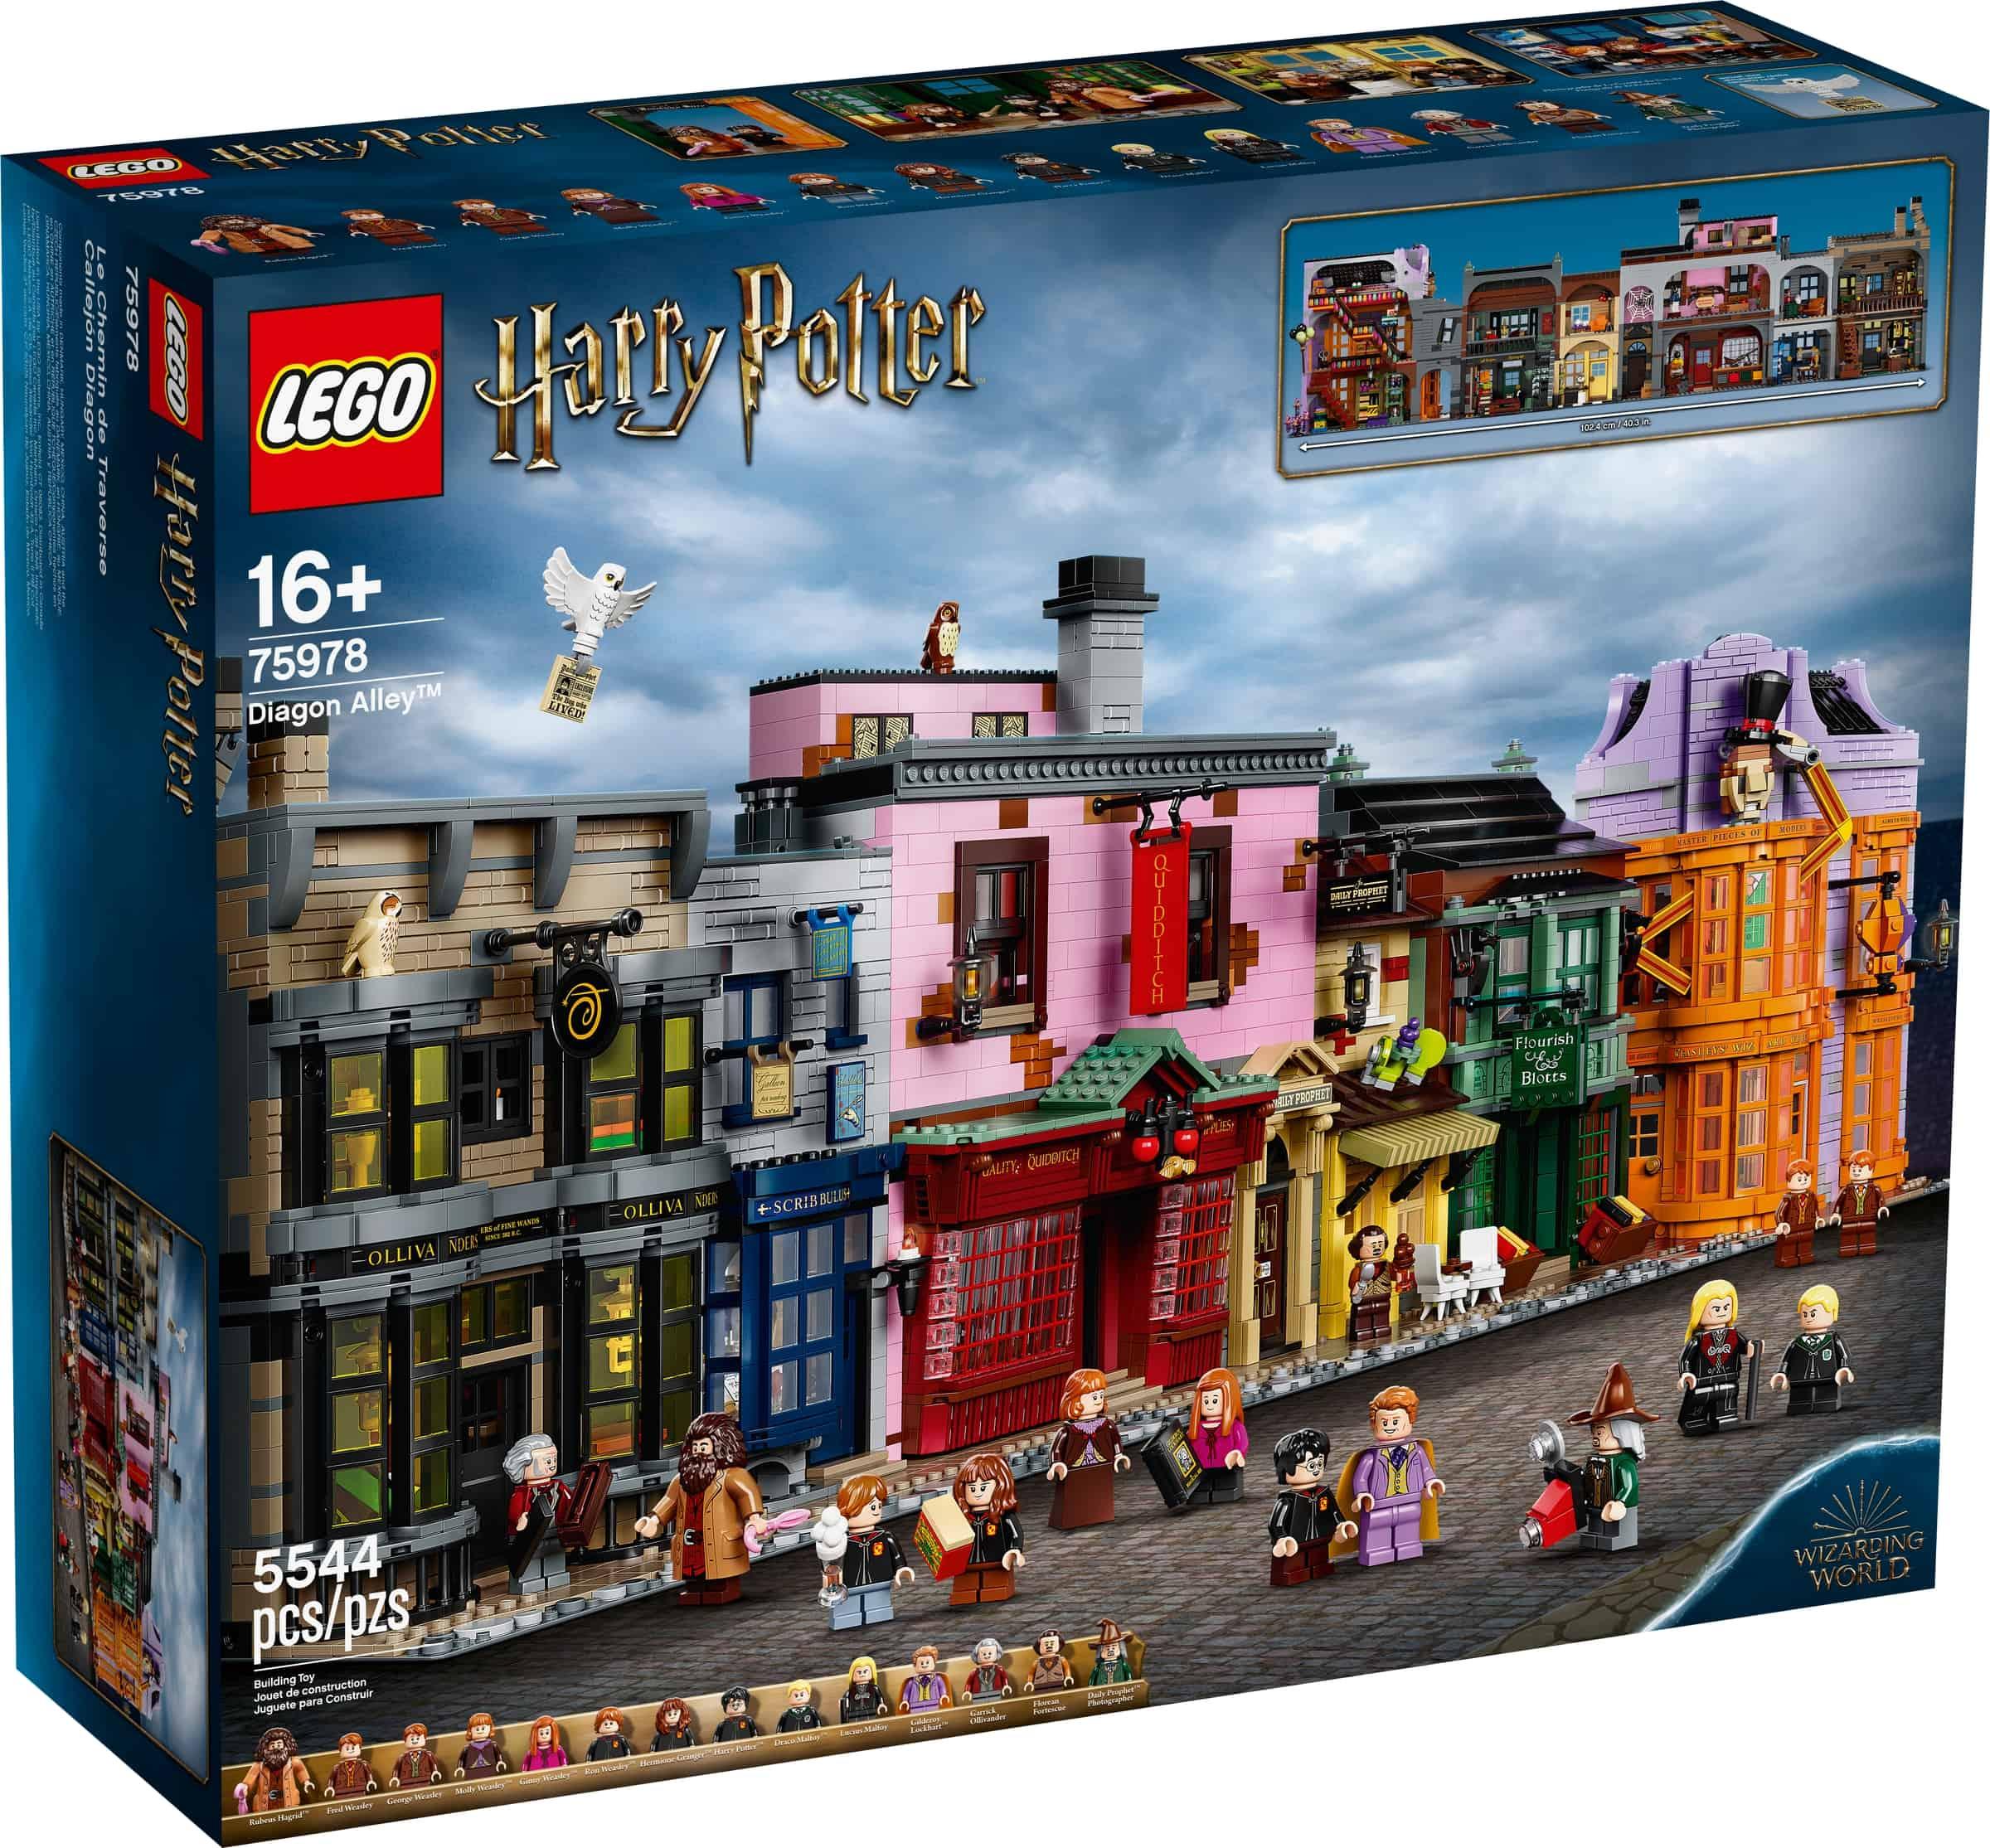 LEGO 75978 Diagon Alley